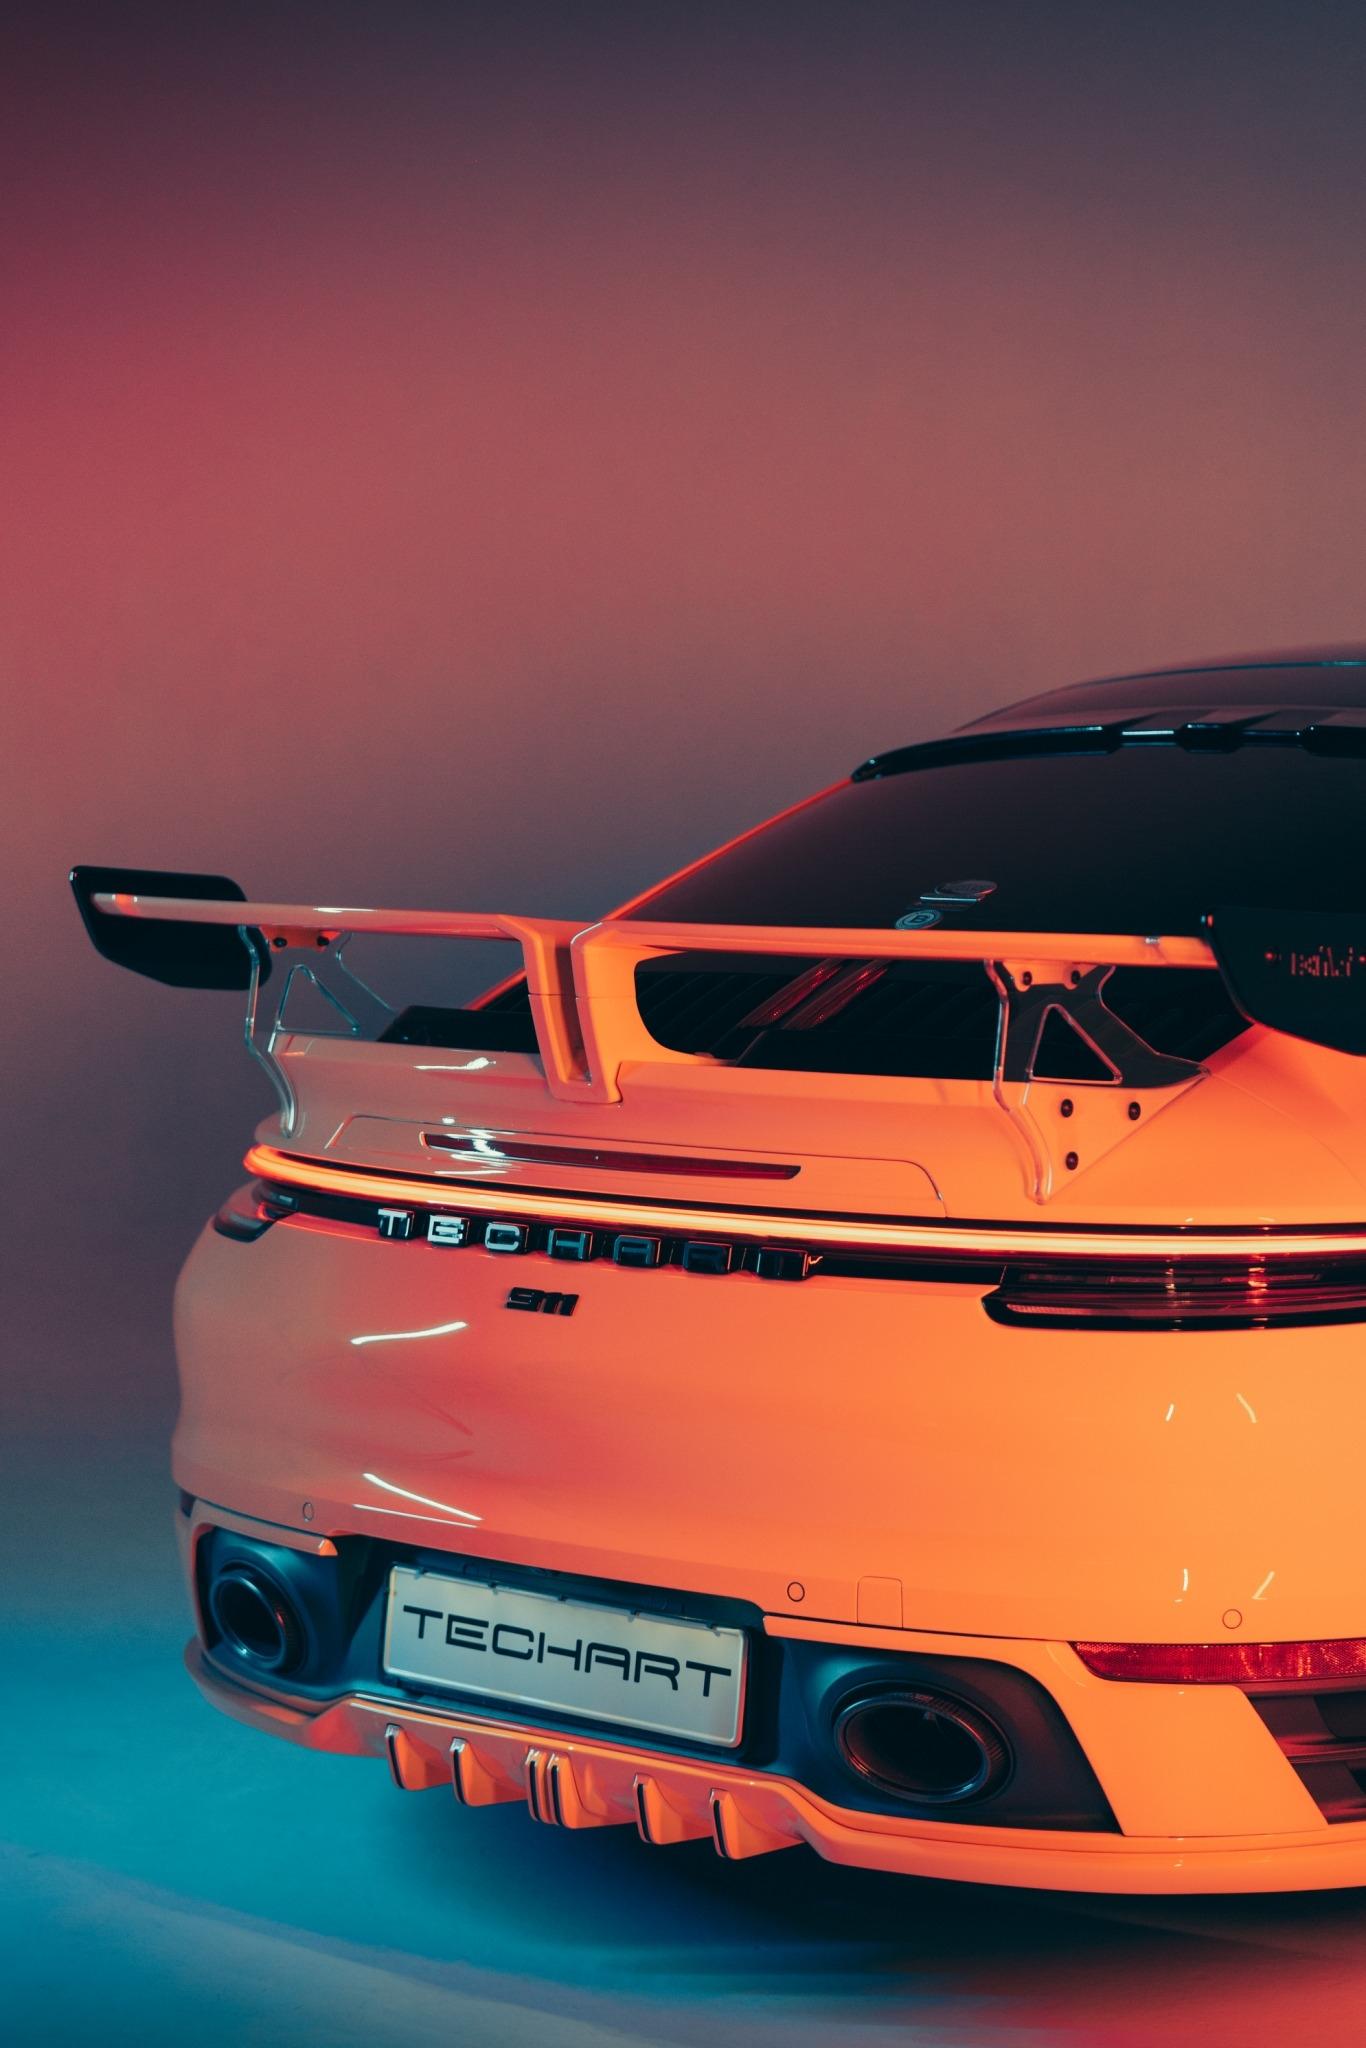 TECHART for The 911 models